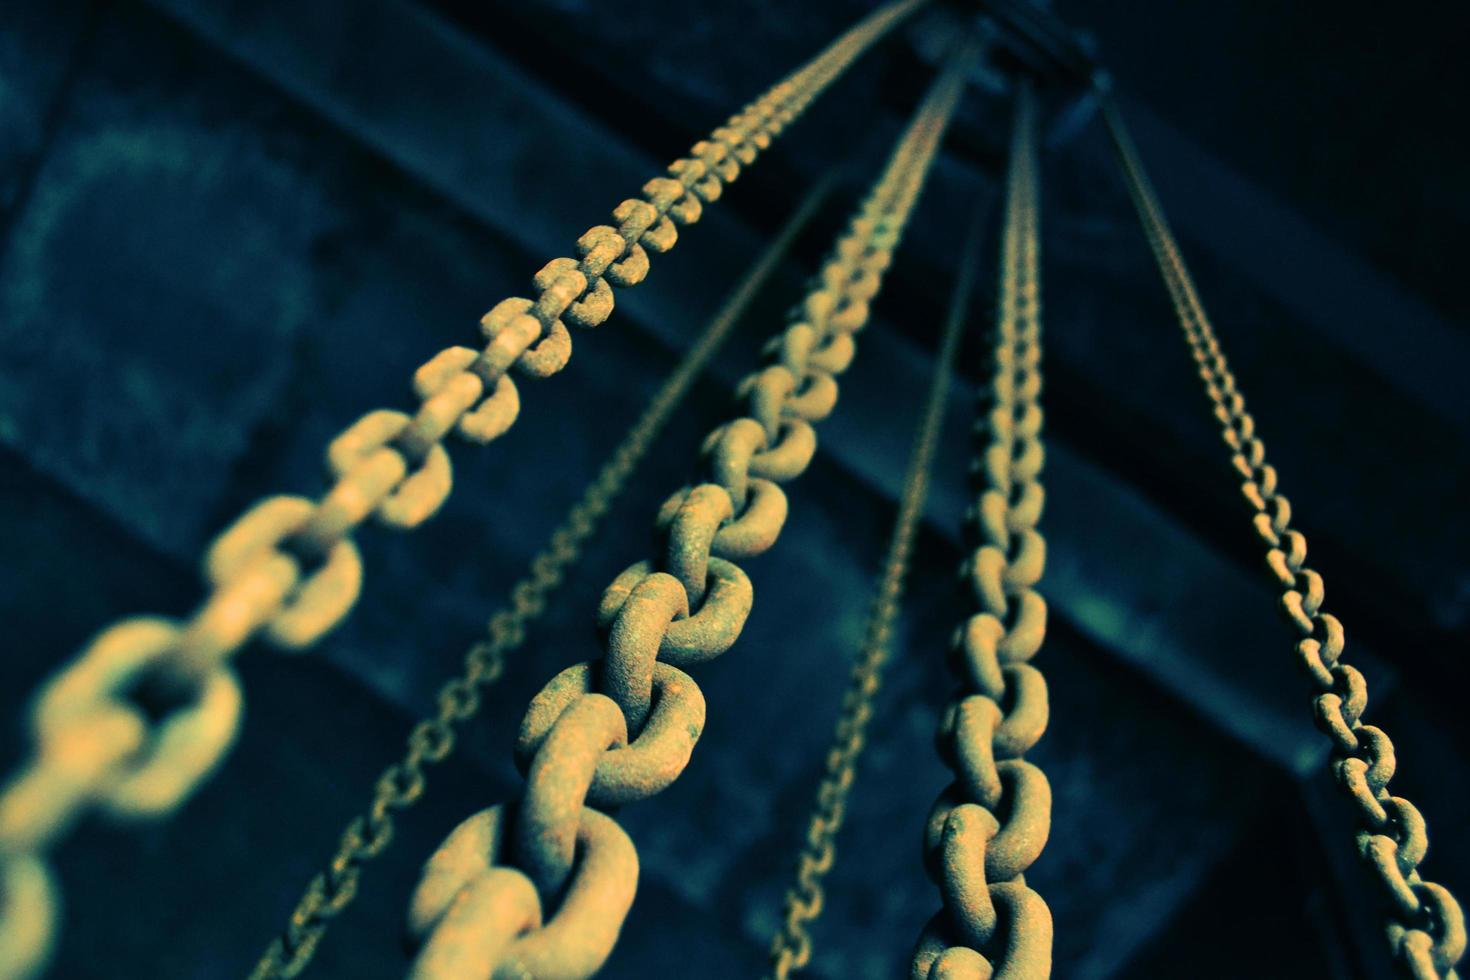 Low angle of metal chains photo